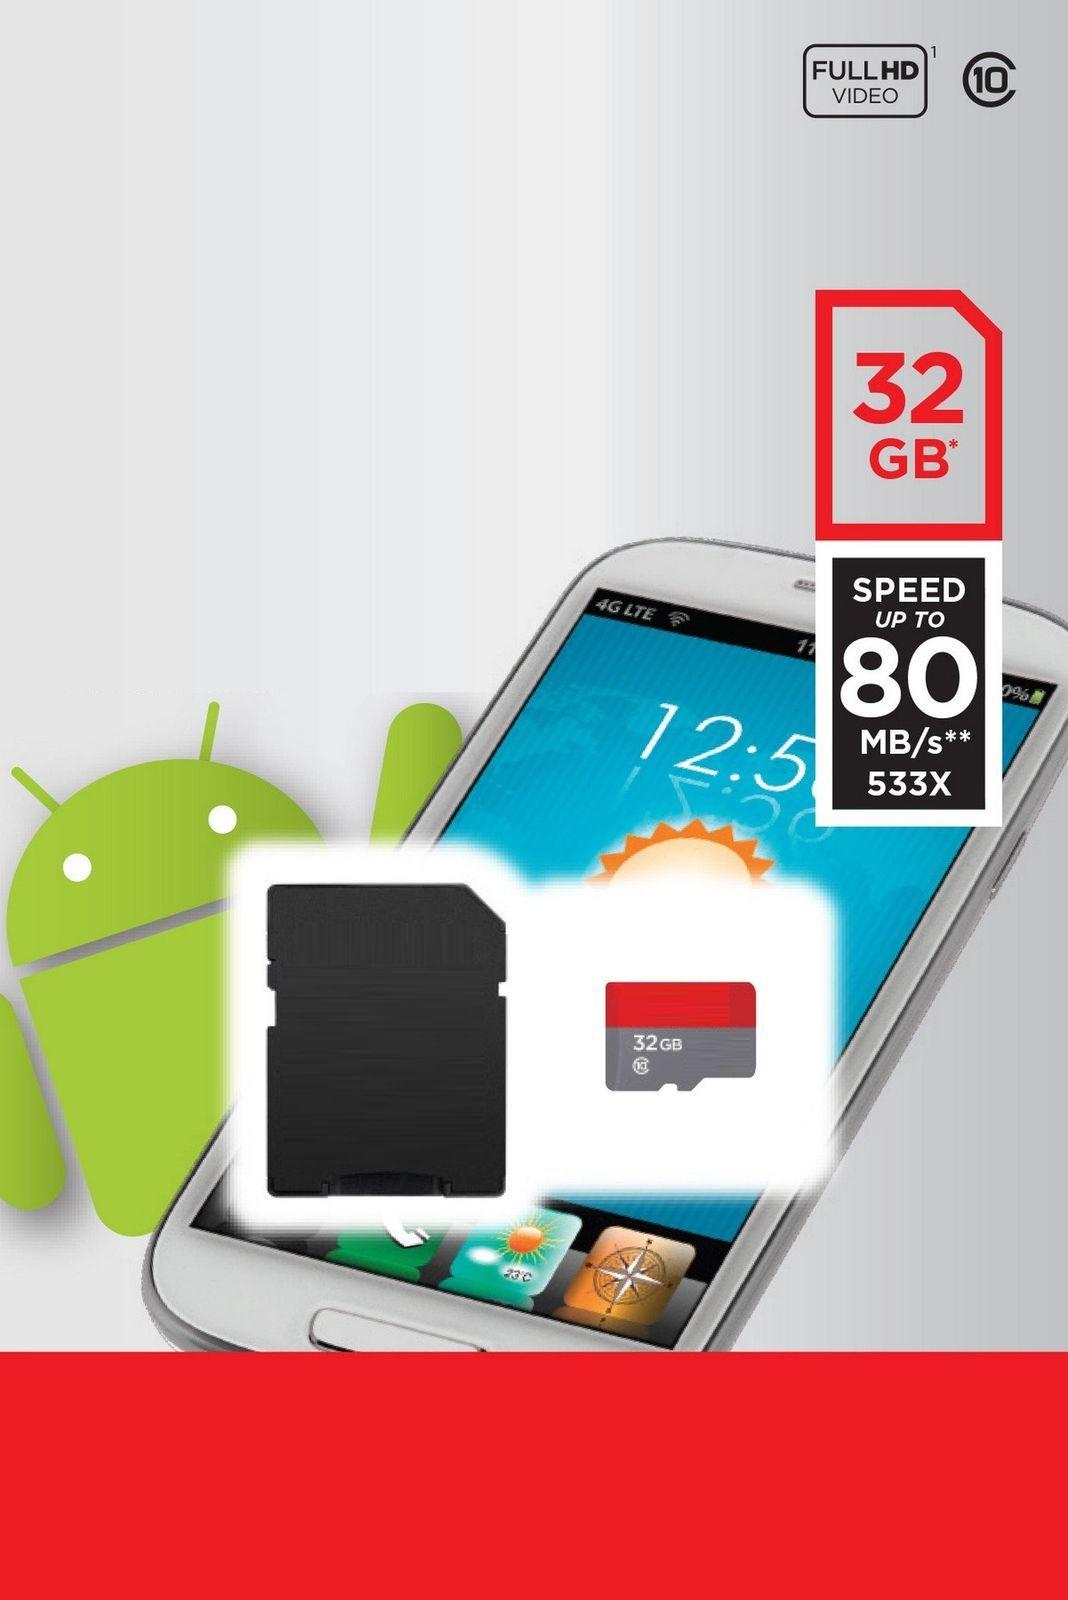 2020 Venta caliente Blanco A1 100mbps Teléfono Android 16GB 32GB 64GB 128GB Clase 10 Tarjeta de memoria 256GB UHS-1 UHS-I U1 TF Tarjeta SD